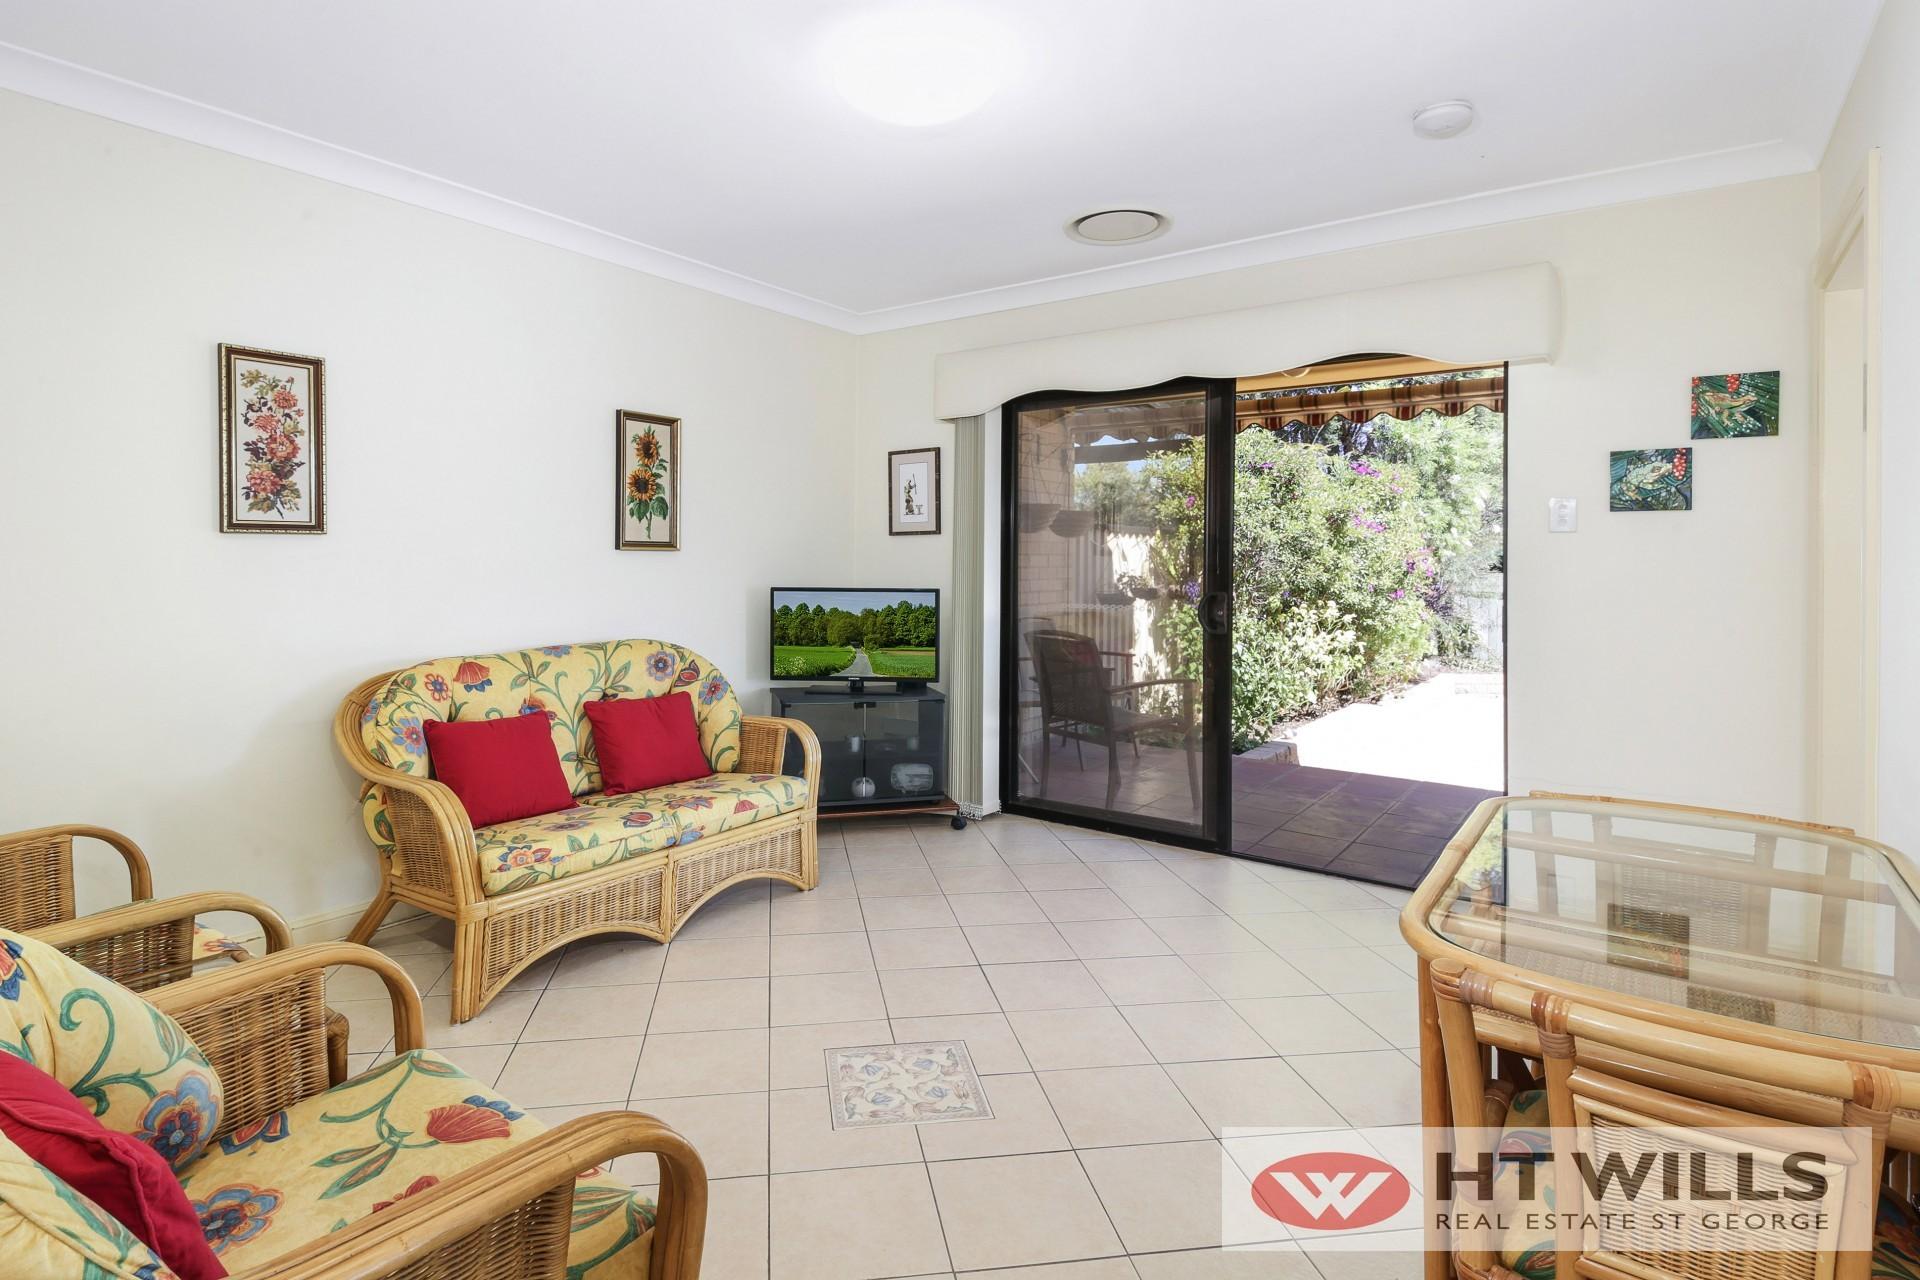 Image: Bright Low Maintenance Villa in quiet location